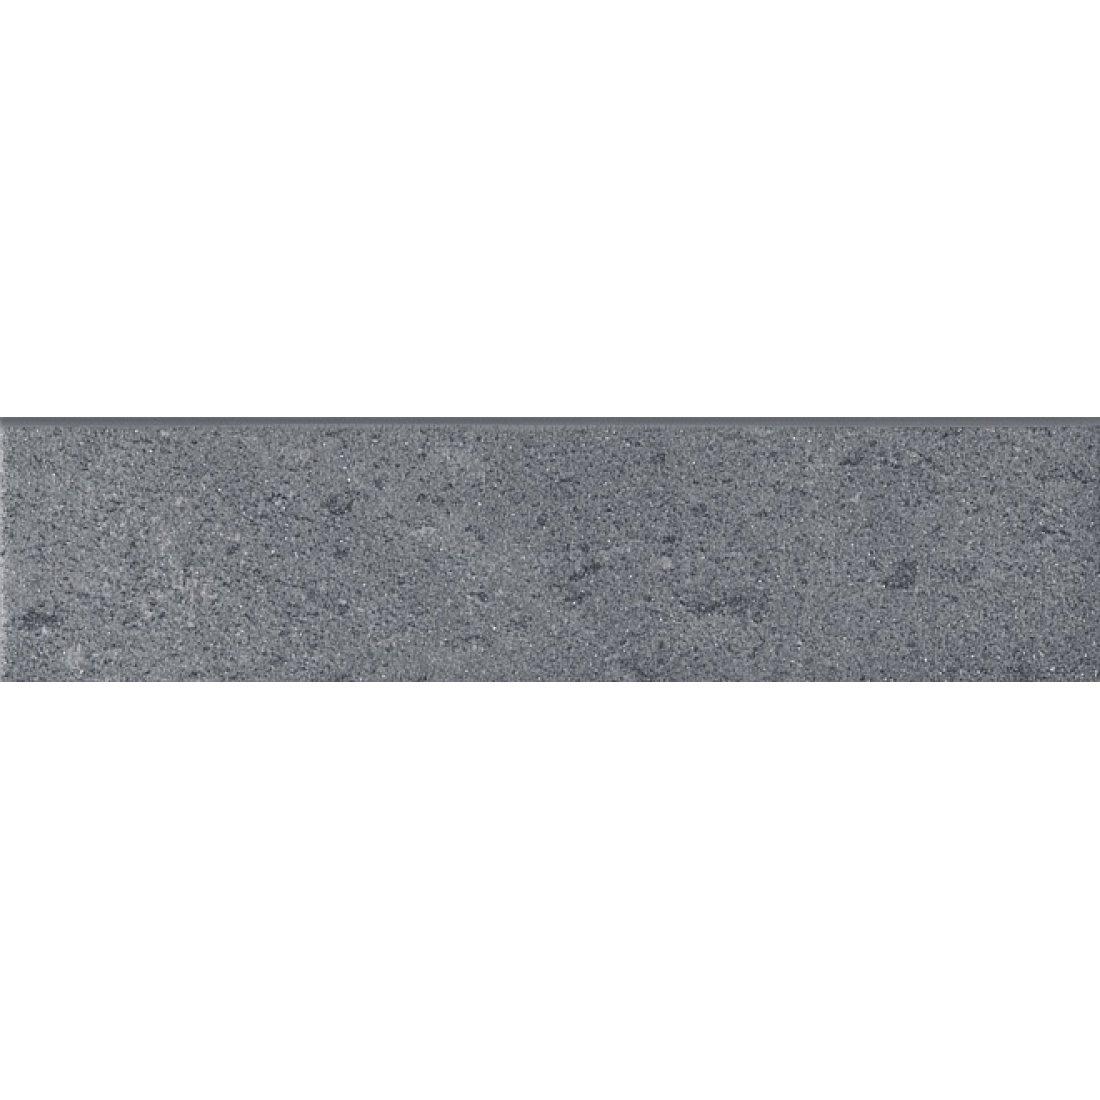 Плинтус Аллея серый темный 30*7,2 KERAMA MARAZZI, артикул SG912000N-4BT